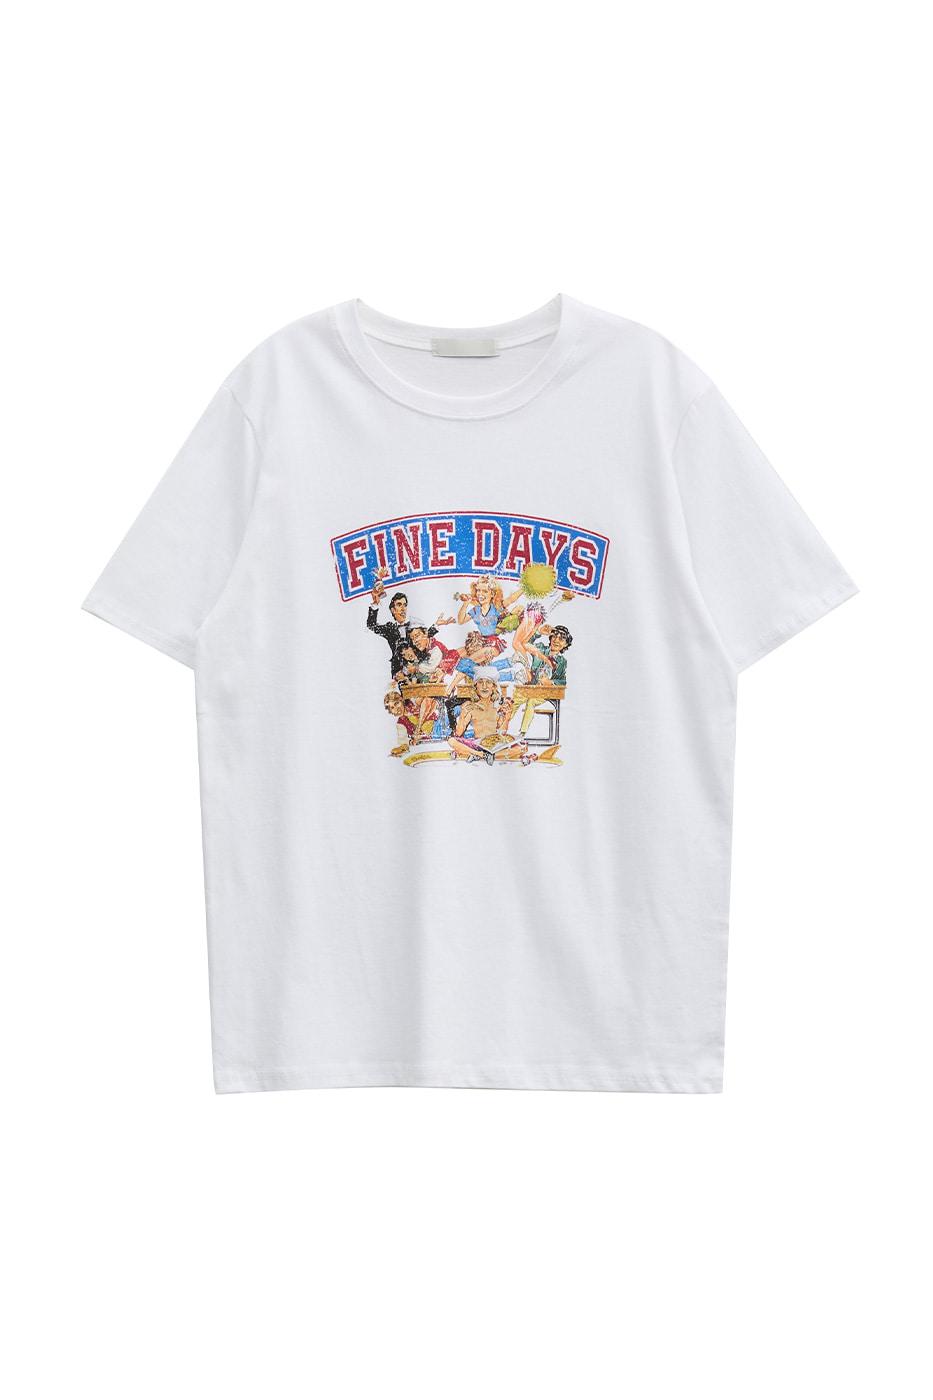 Fine Days T-shirt